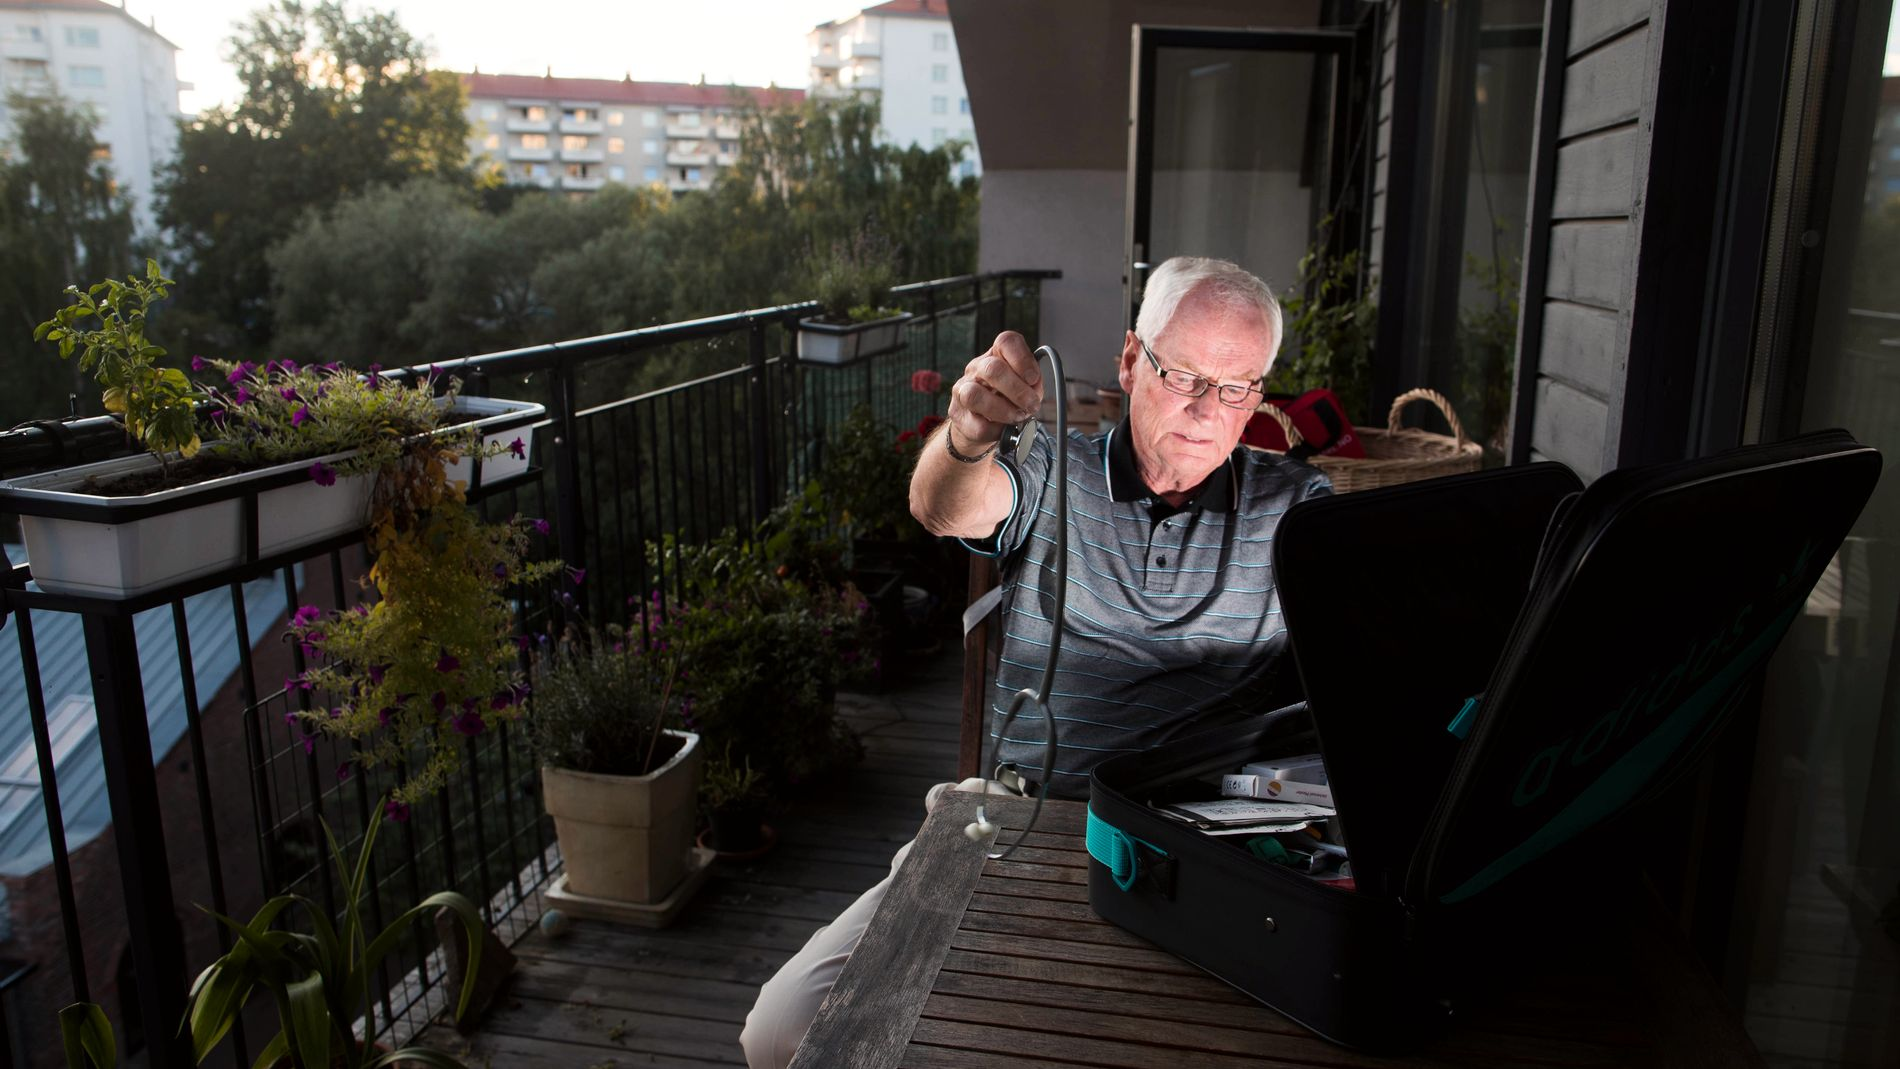 TIDLIGERE LANDSLAGSLEGE: Thor-Øistein Endsjø var med å innføre astmamedisin til norske friske utøvere under OL i Los Angeles i 1984. Her hjemme på Sagene. Han tar enda enkelte oppdrag som lege i idrettssammenheng.